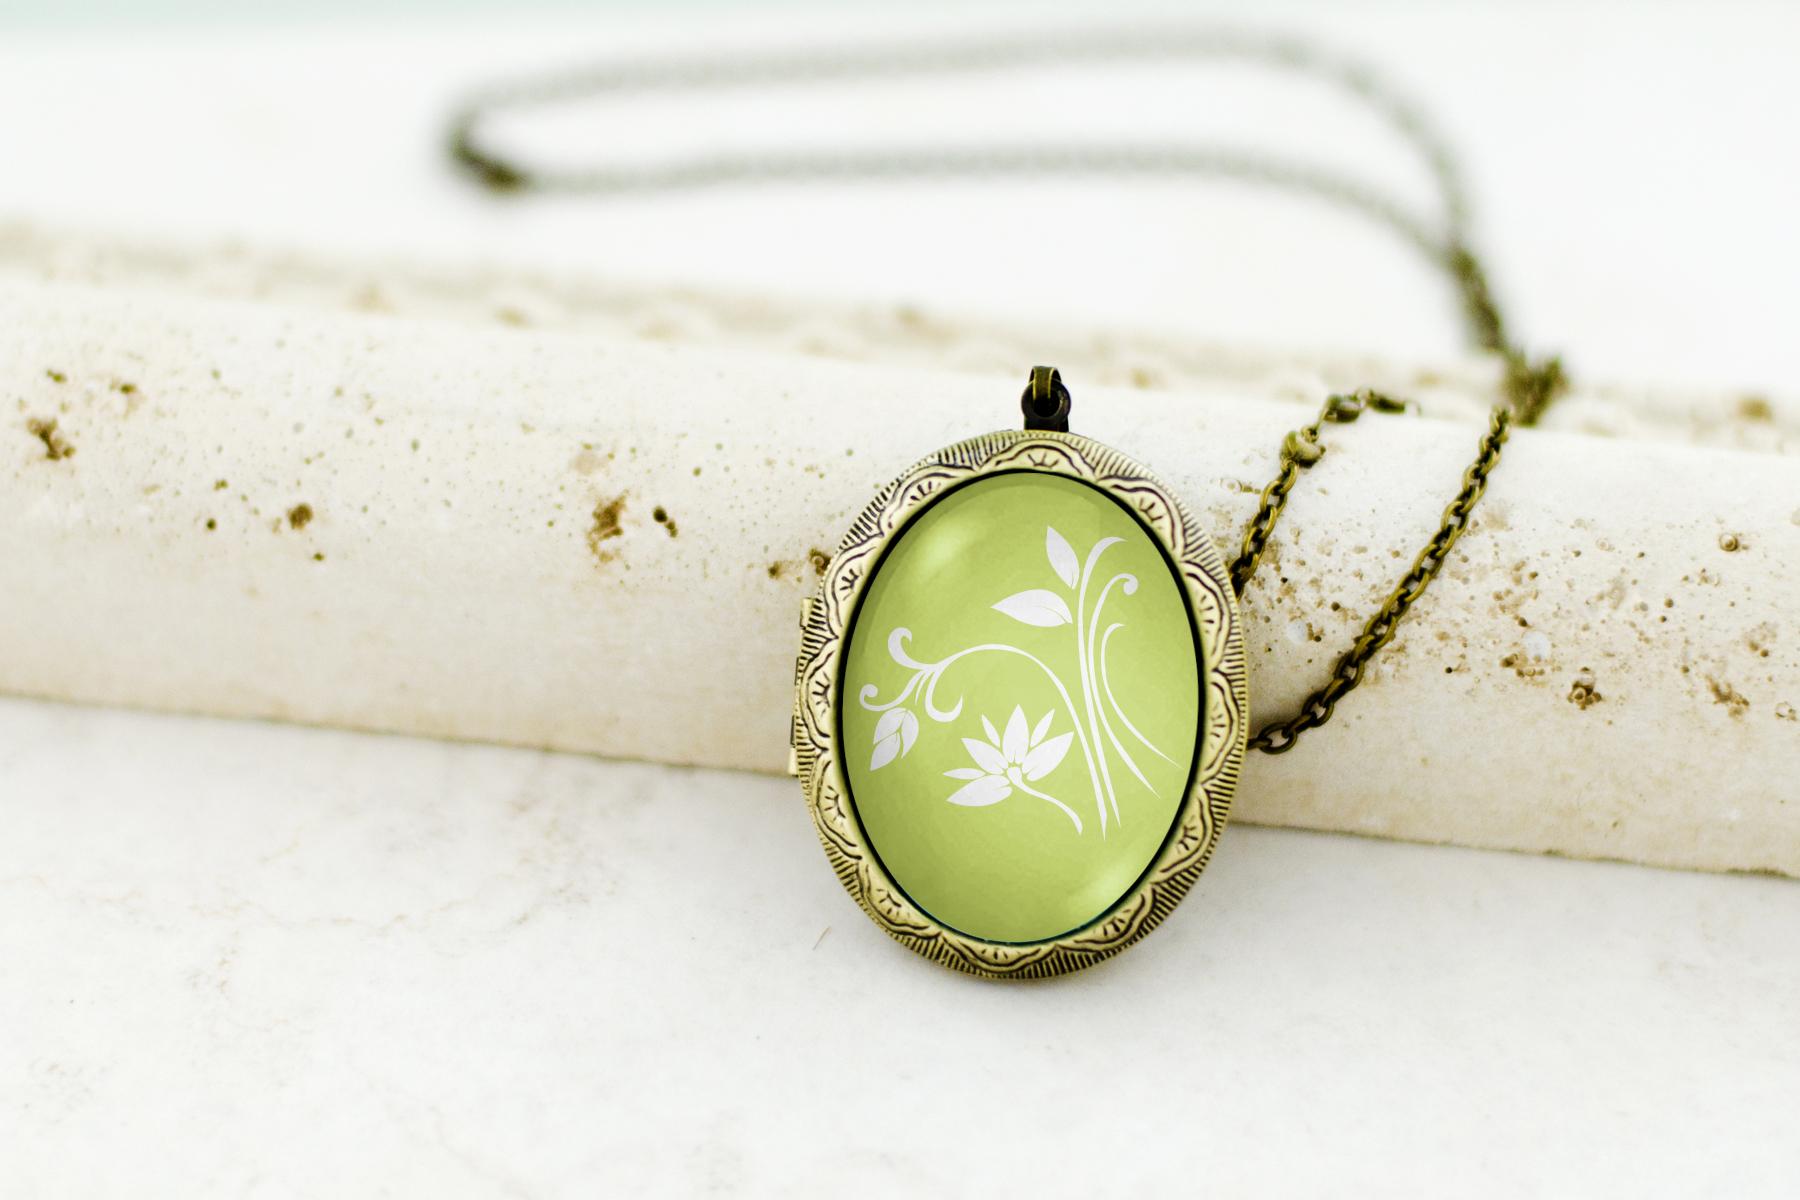 art locket necklace